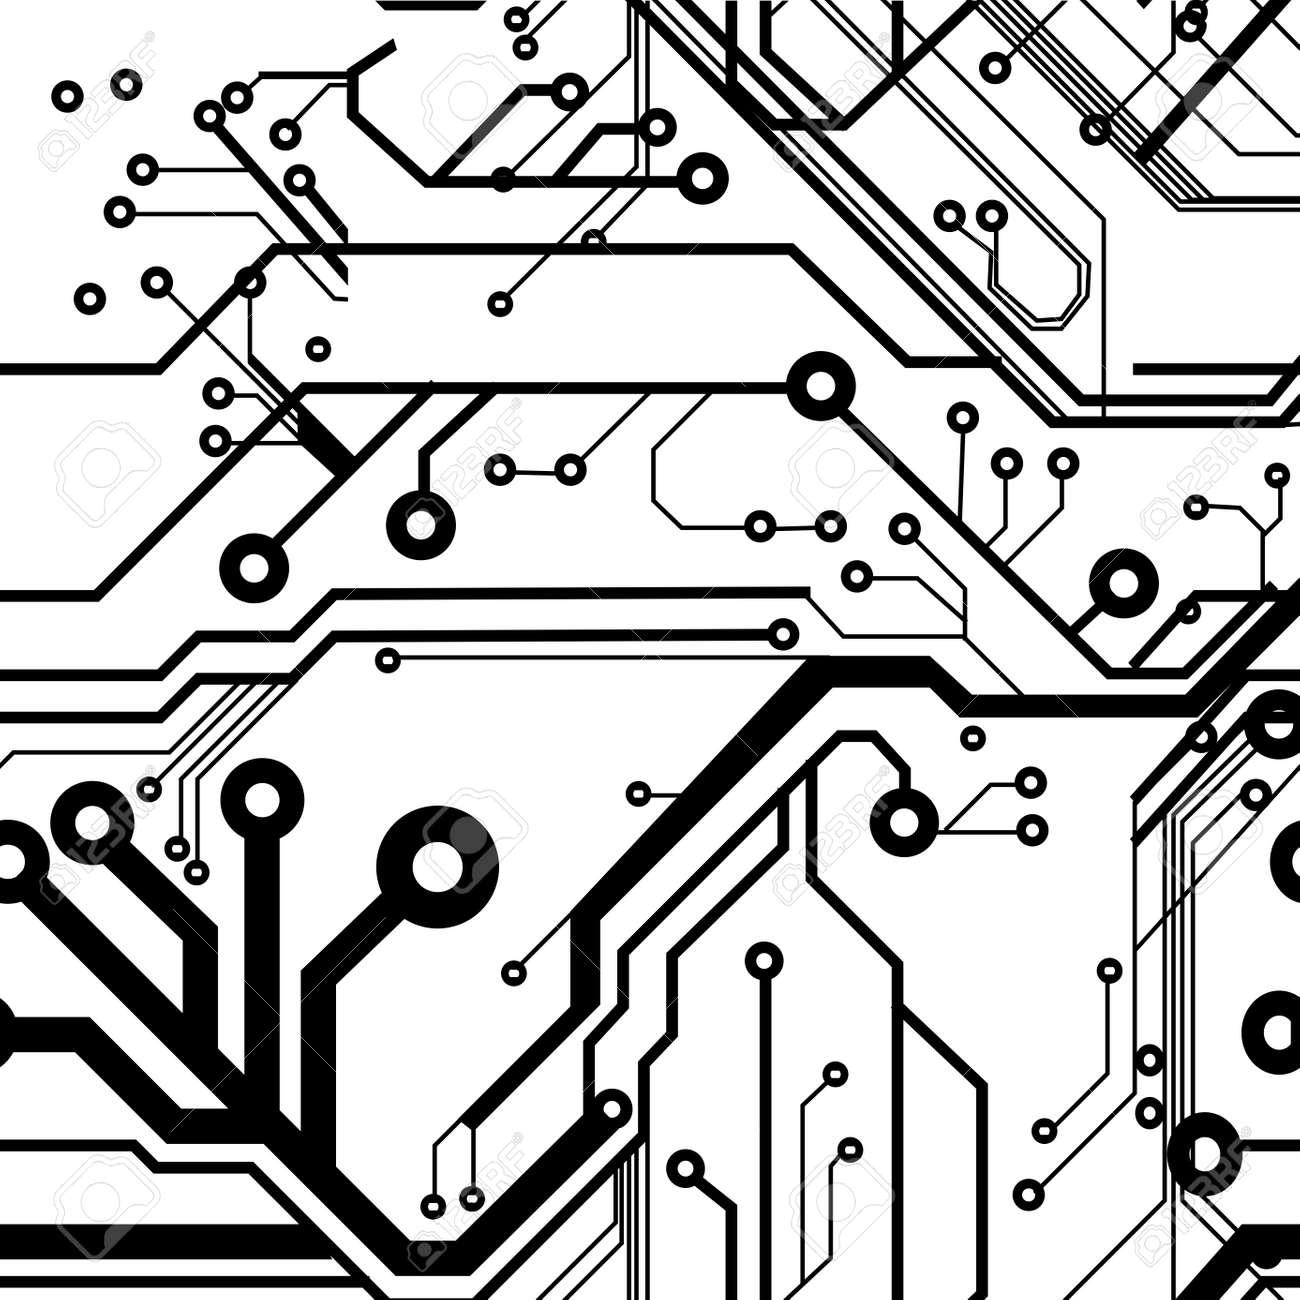 side vector circboard wiring diagram seamless printed circuit board pattern royalty free cliparts  seamless printed circuit board pattern